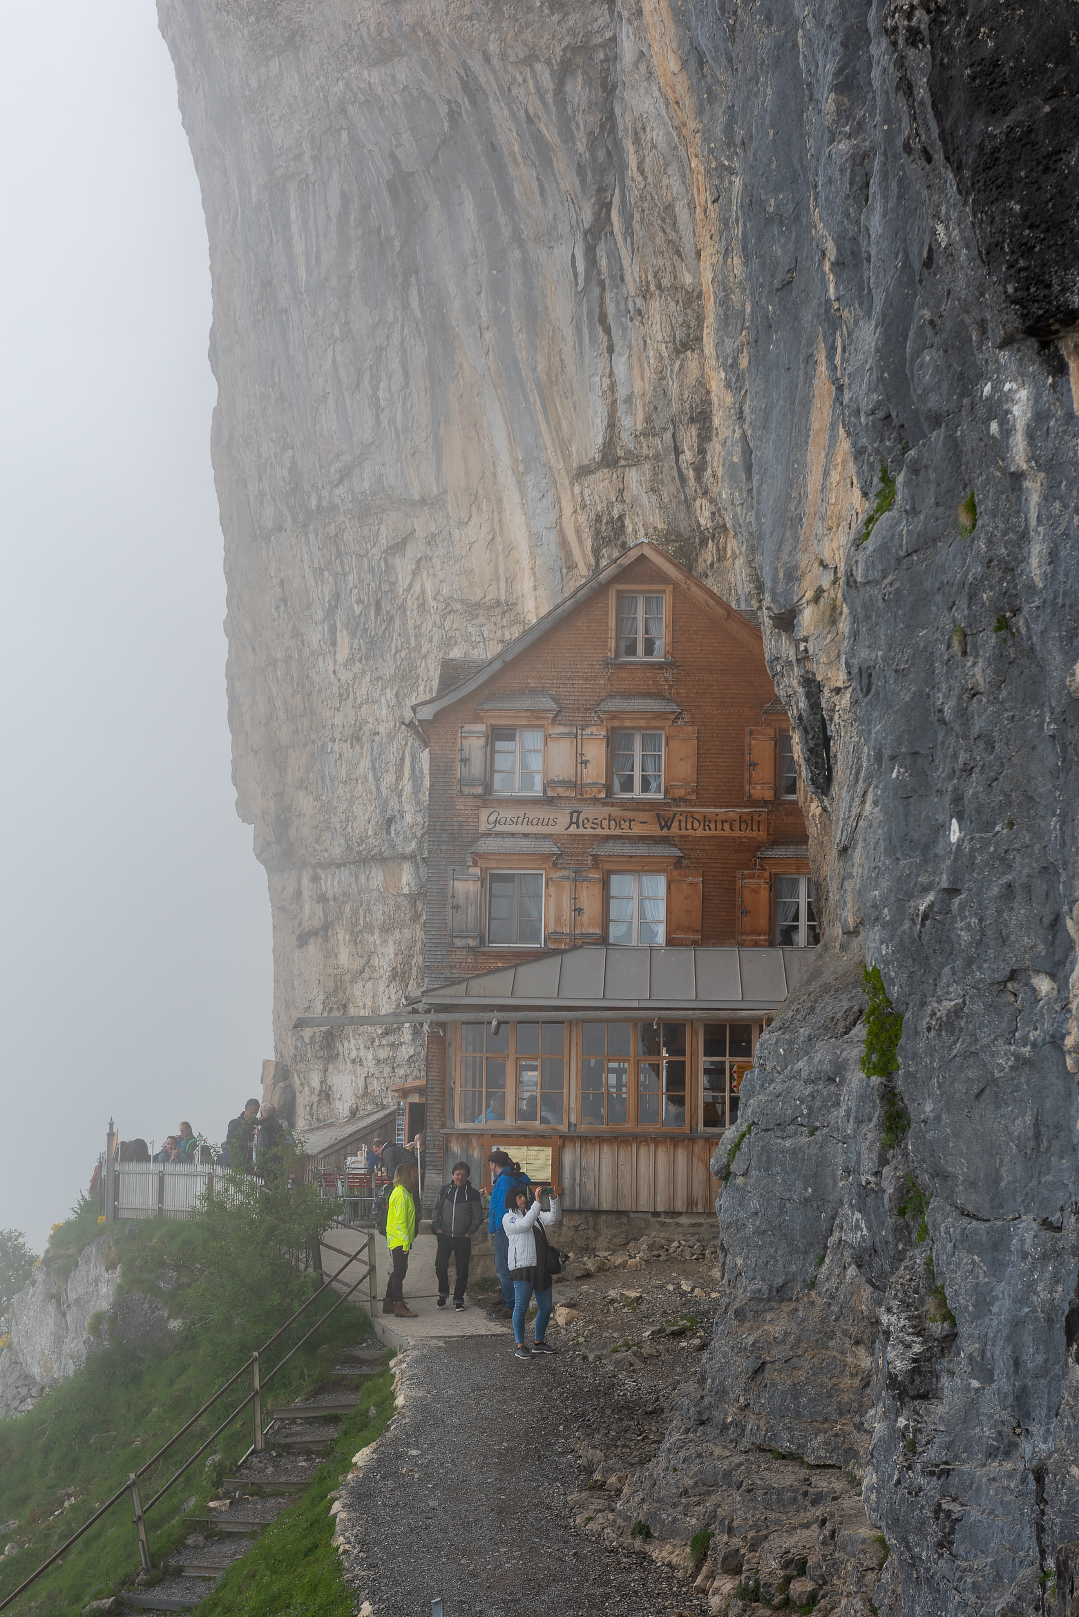 The fog-enshrouded Gasthaus Aescher Wildkirchli on Ebenalp near Appenzell, Switzerland.